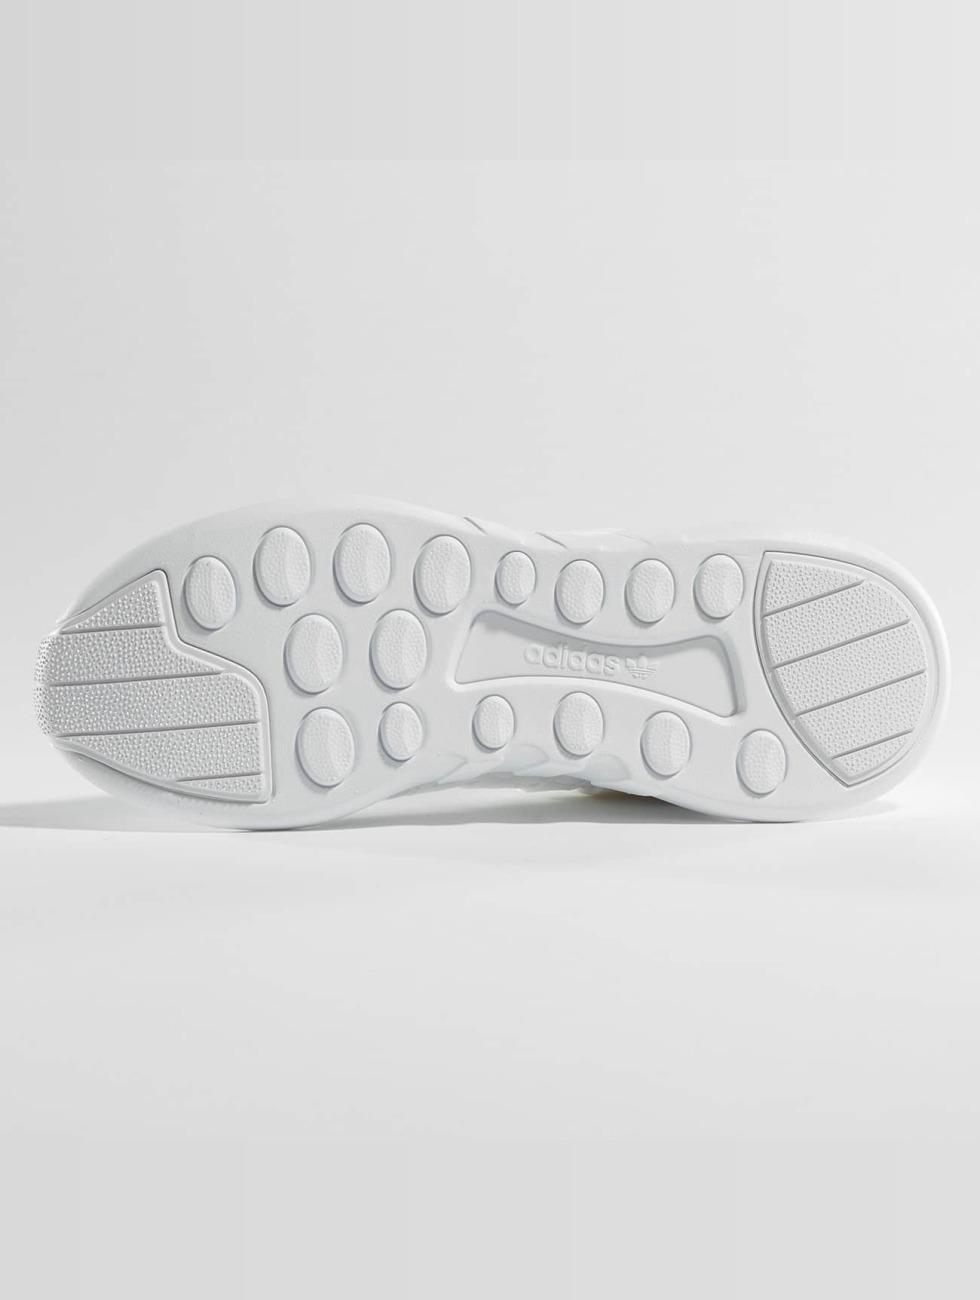 Adidas Originals Supporto Schoen / Attrezzature Sneaker Adv In Ingegno 368.468 1C24DoMW